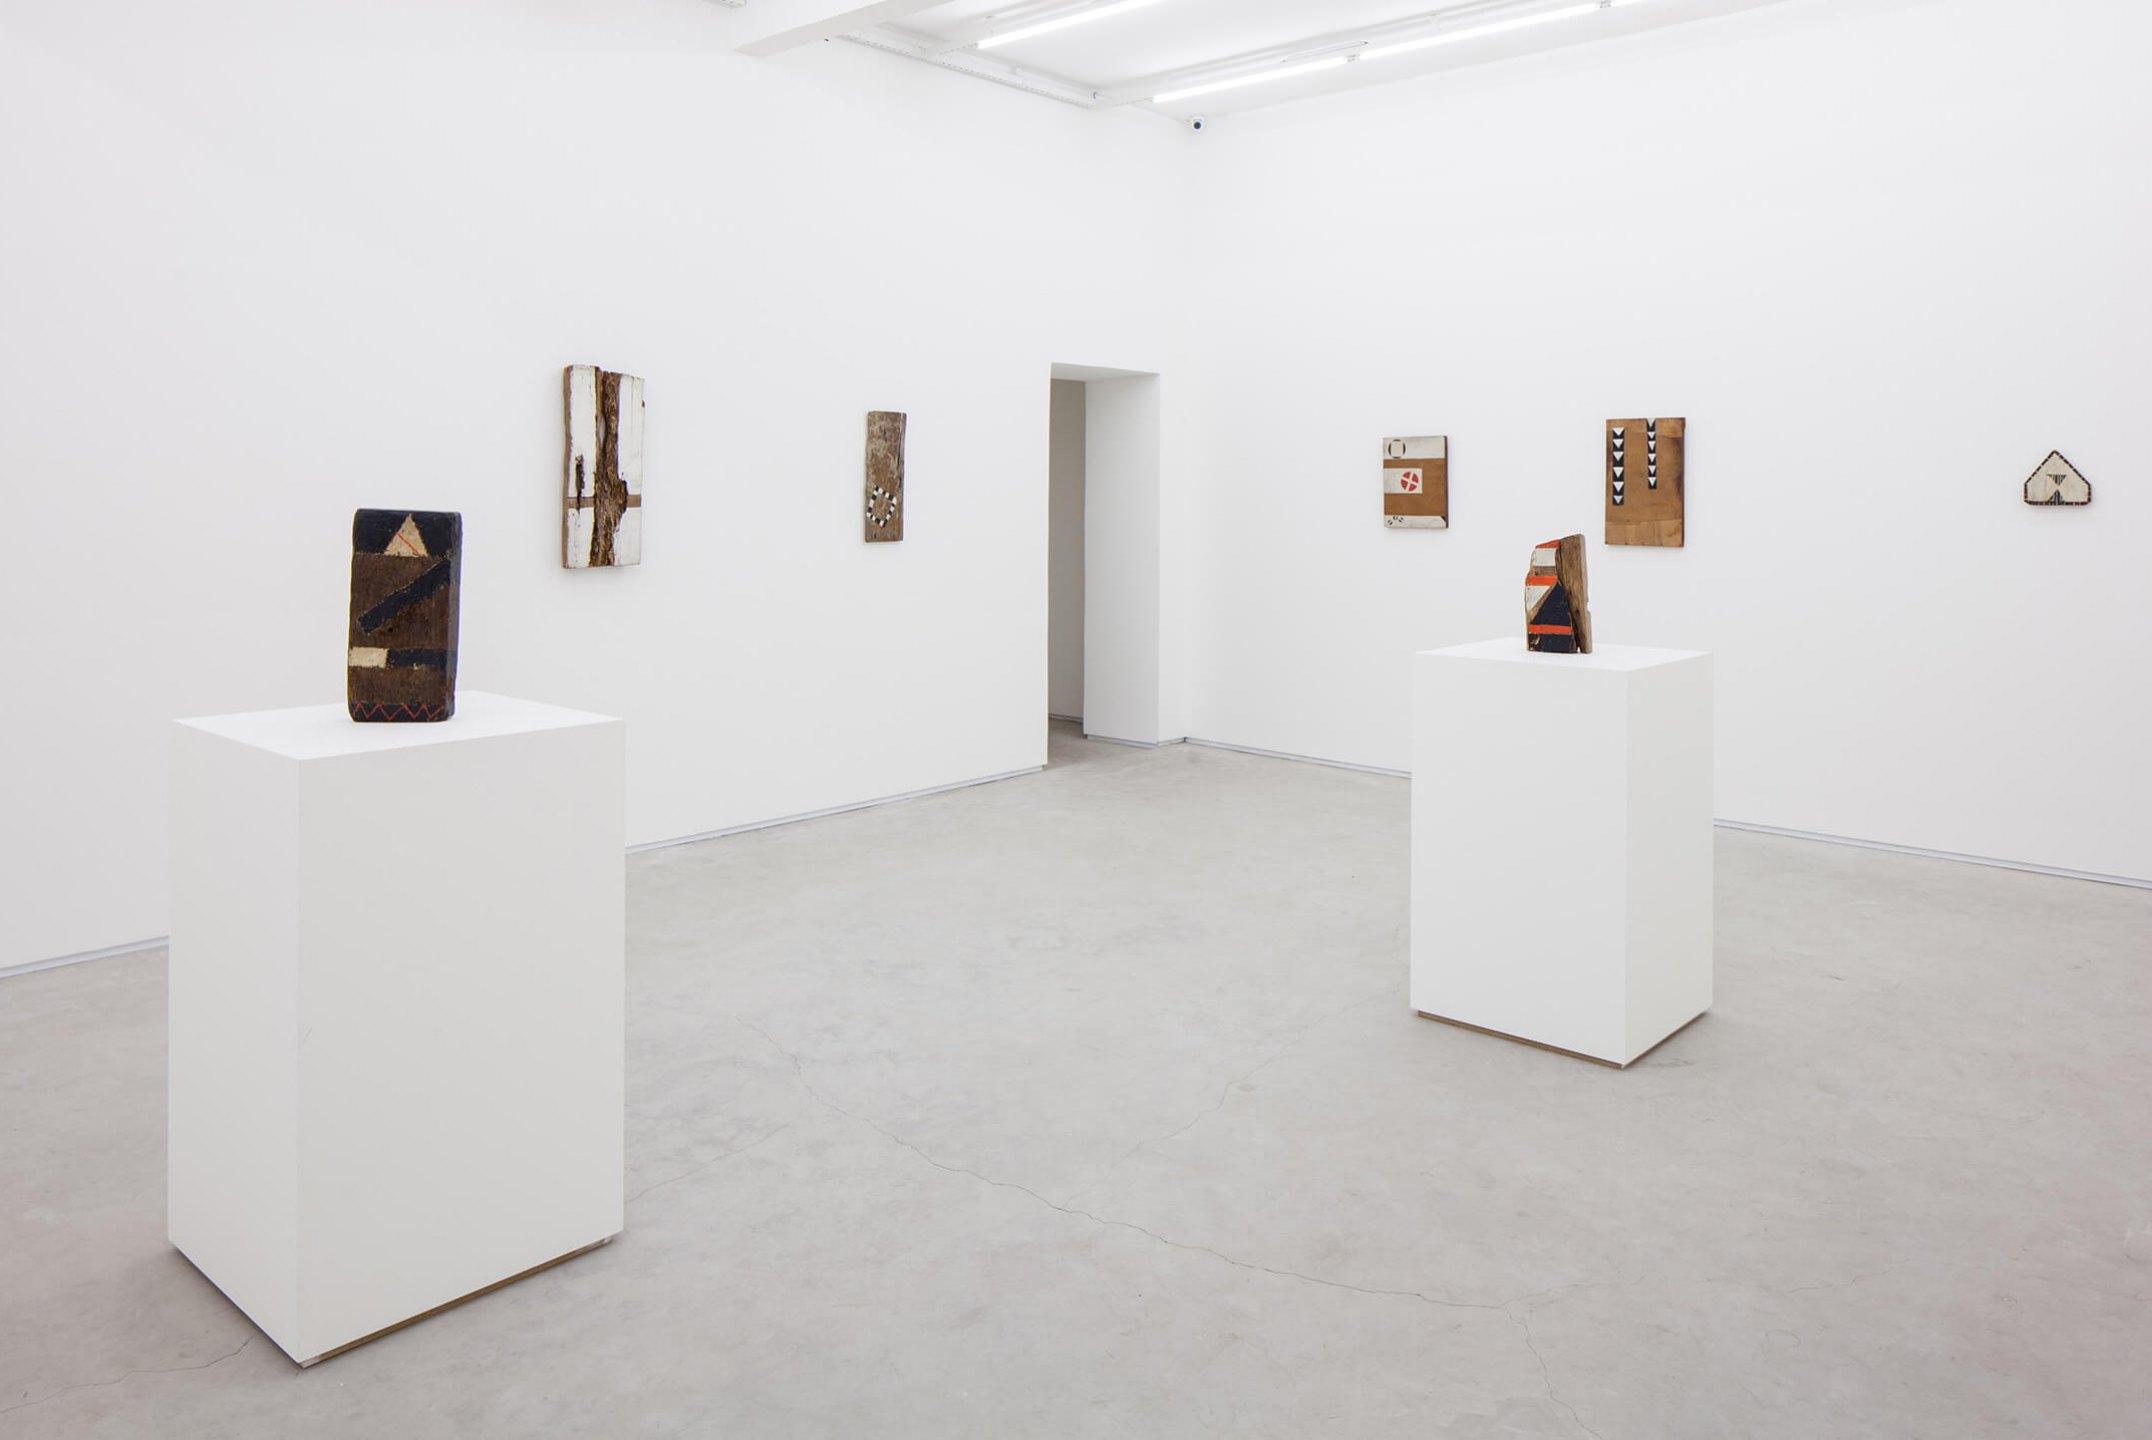 Celso Renato, Mendes Wood DM, São Paulo, 2015 - Mendes Wood DM